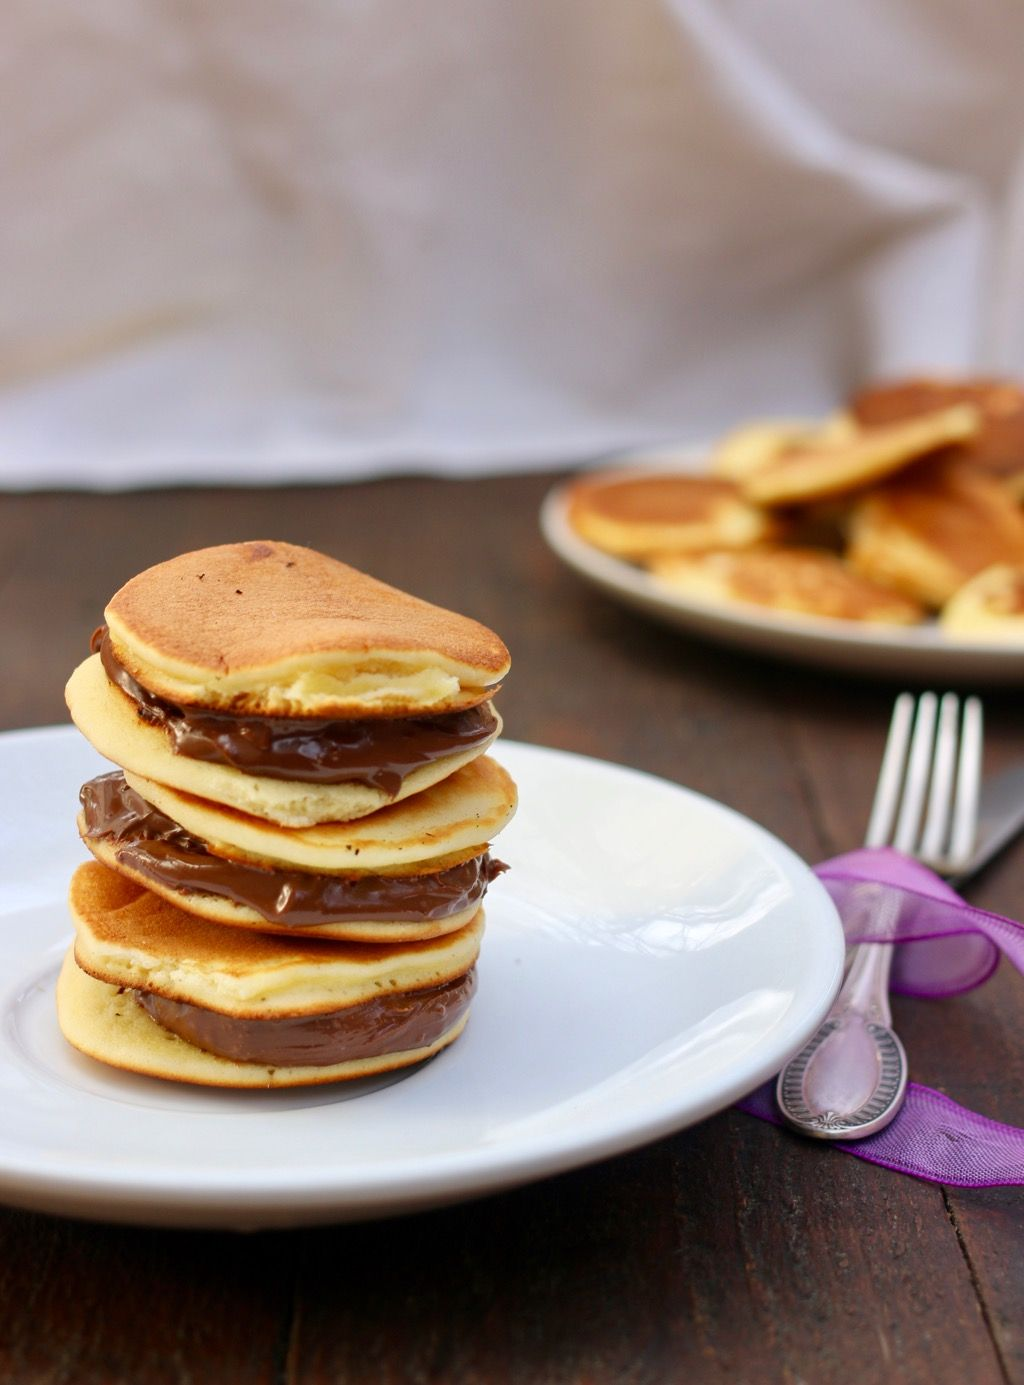 a7c068512bfc6fc8b950c155b06ab3fa - Ricetta Pancake Con Nutella